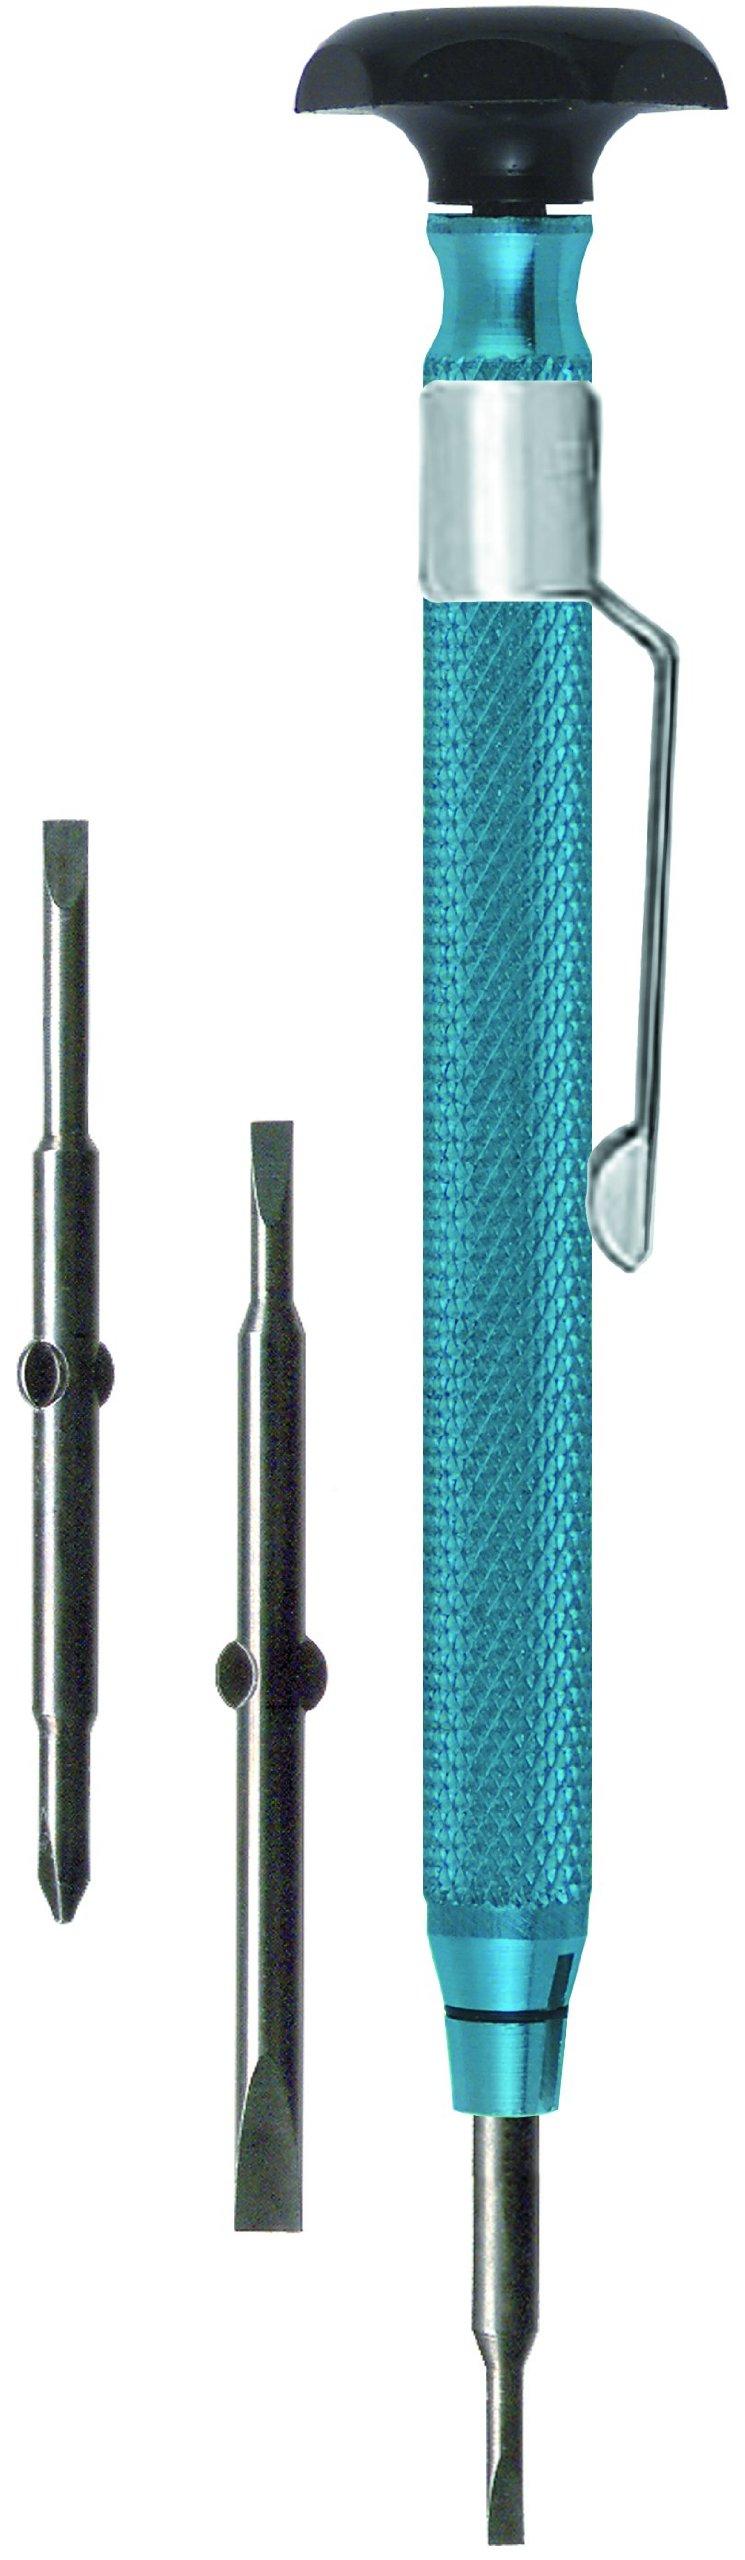 Moody Tools 55-0217 Reversible Tip Chromium Vanadium Steel Screwdriver Set, 4-Piece